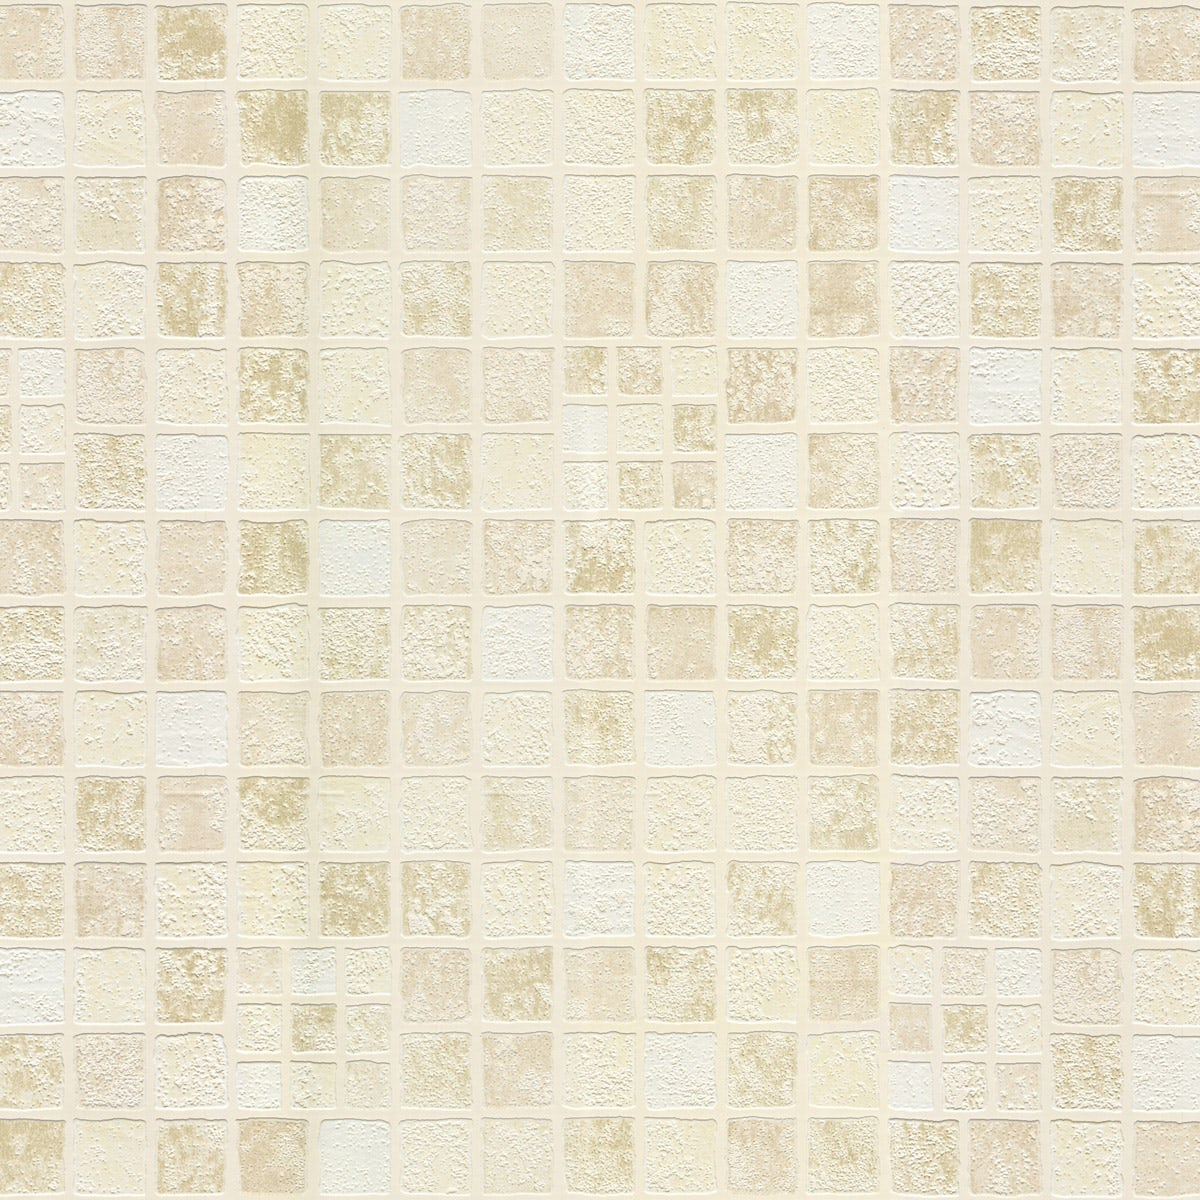 Graham Brown Contour Beige Natural Stone Tile Kitchen: Graham Brown Contour Earthen Beige Wallpaper